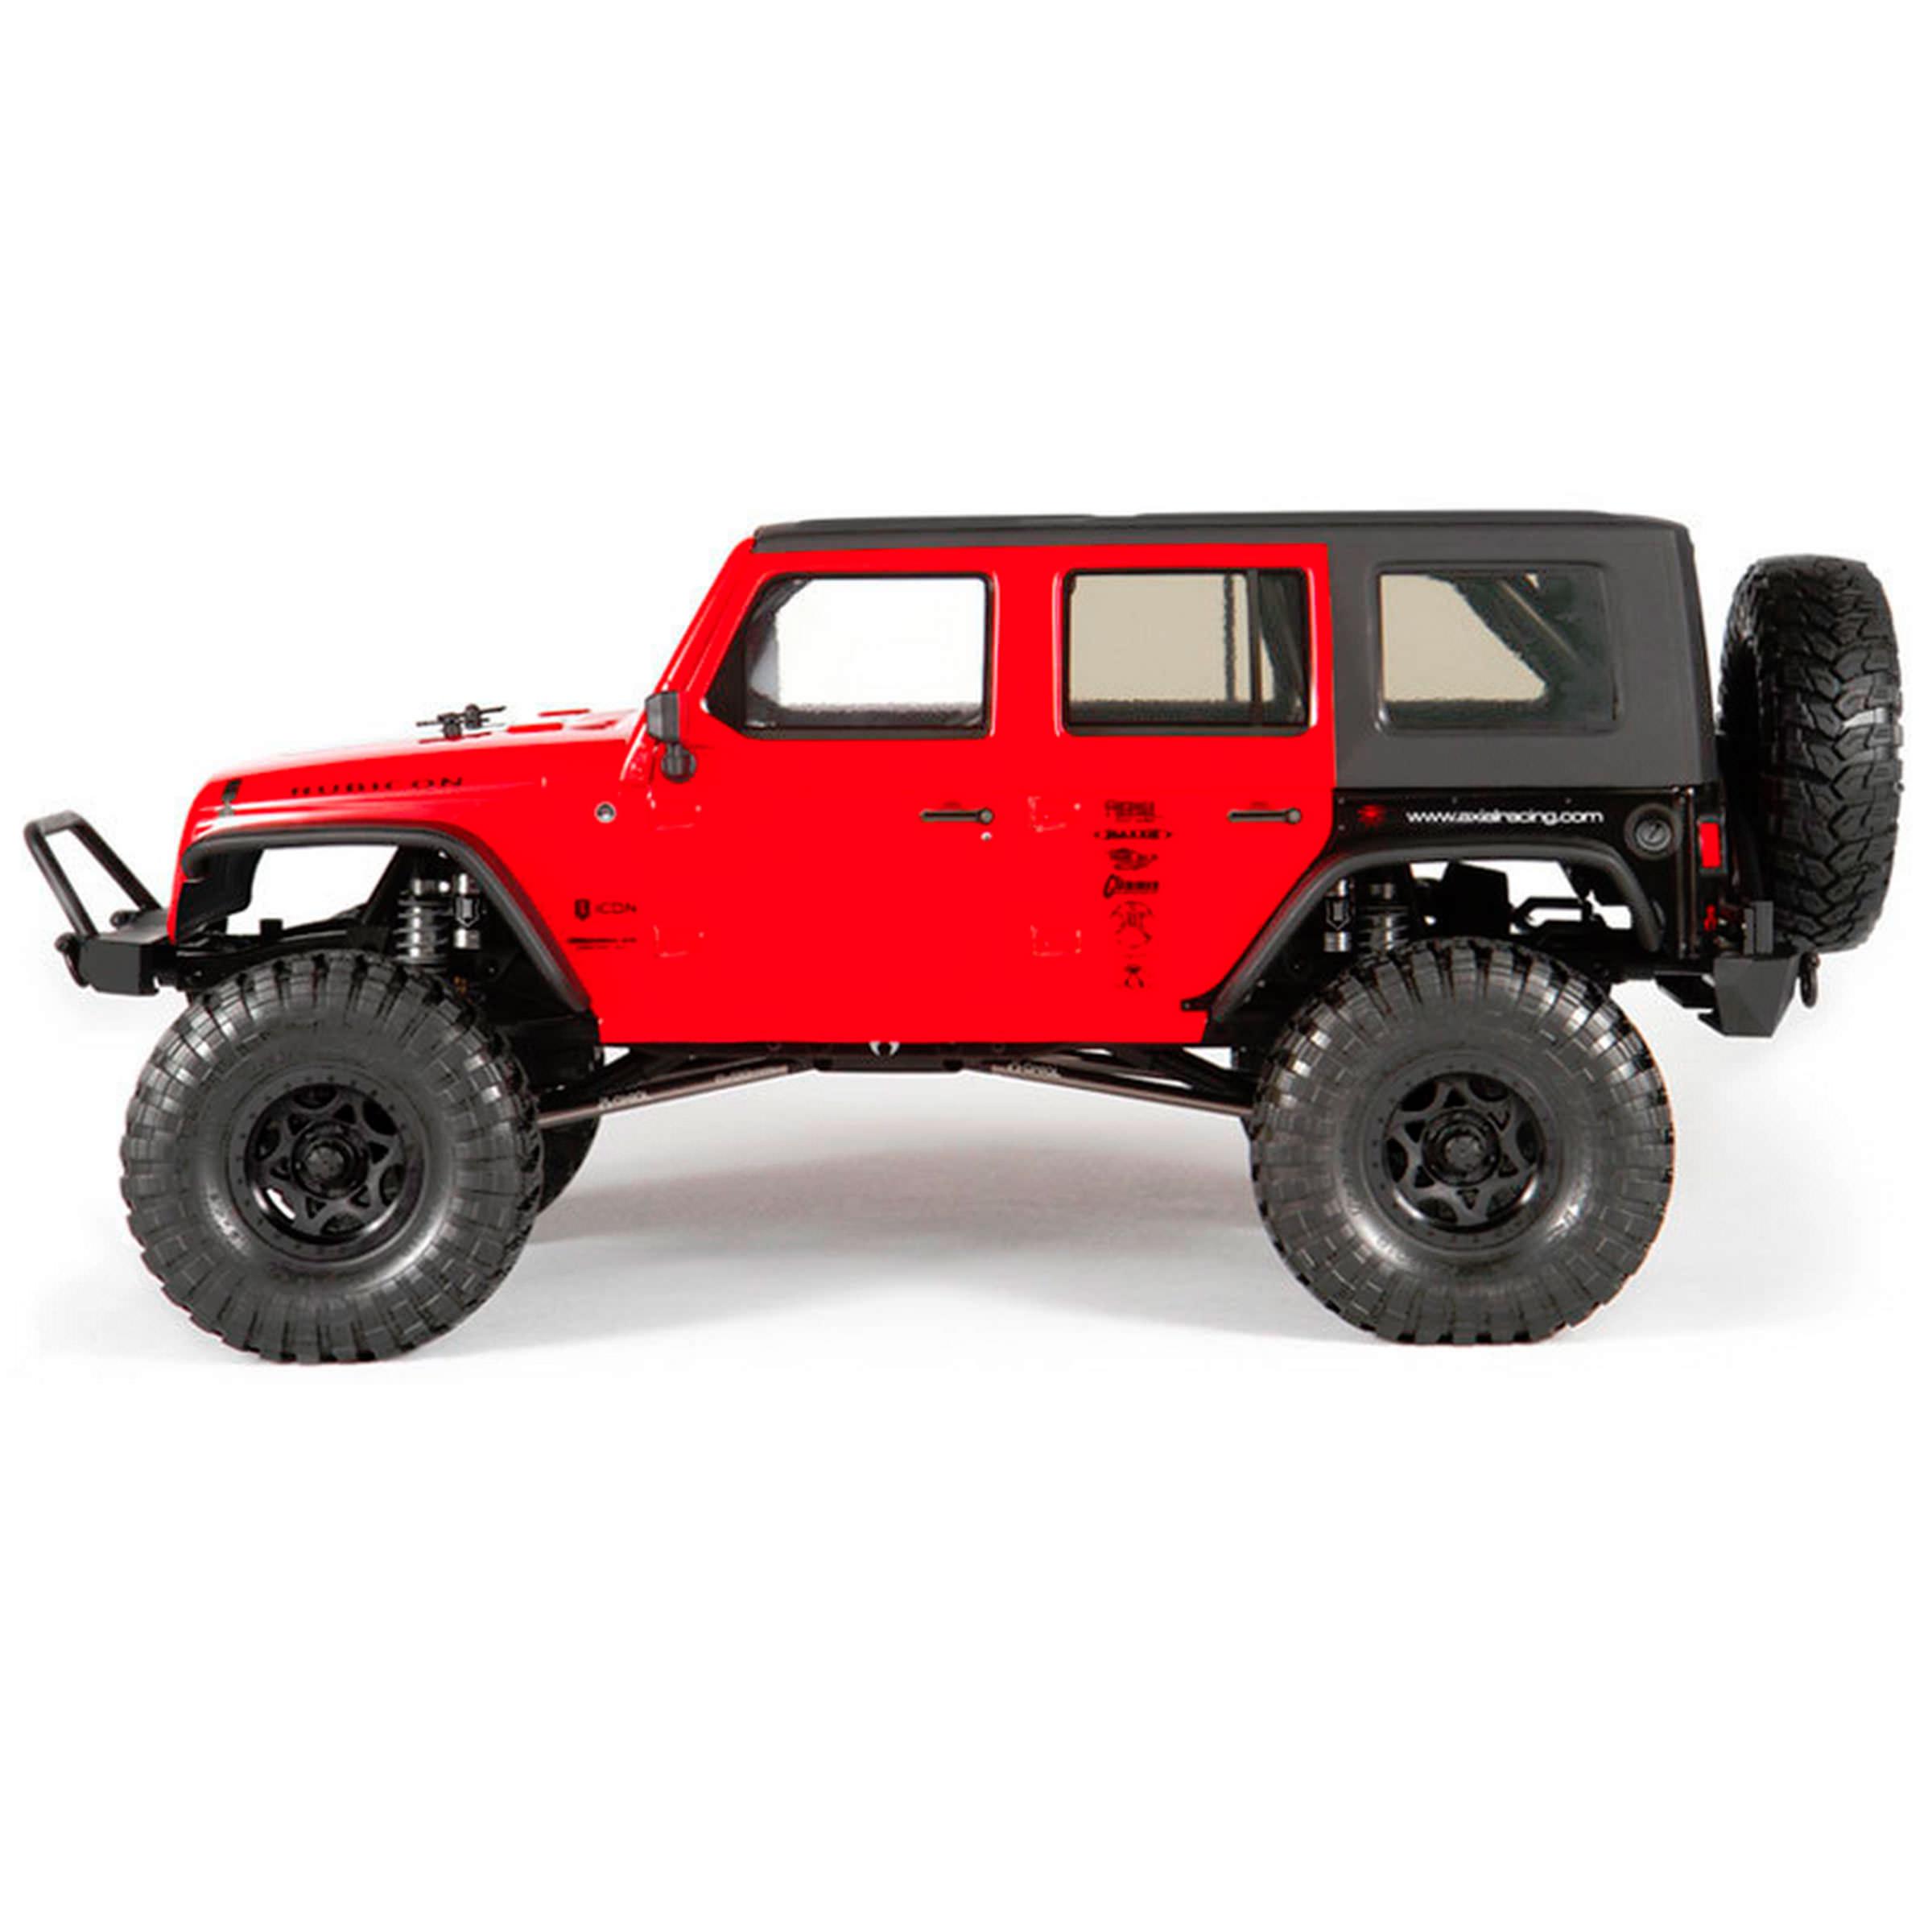 Axial 90027 SCX10 Jeep Wrangler RC Truck Kit At Hobby